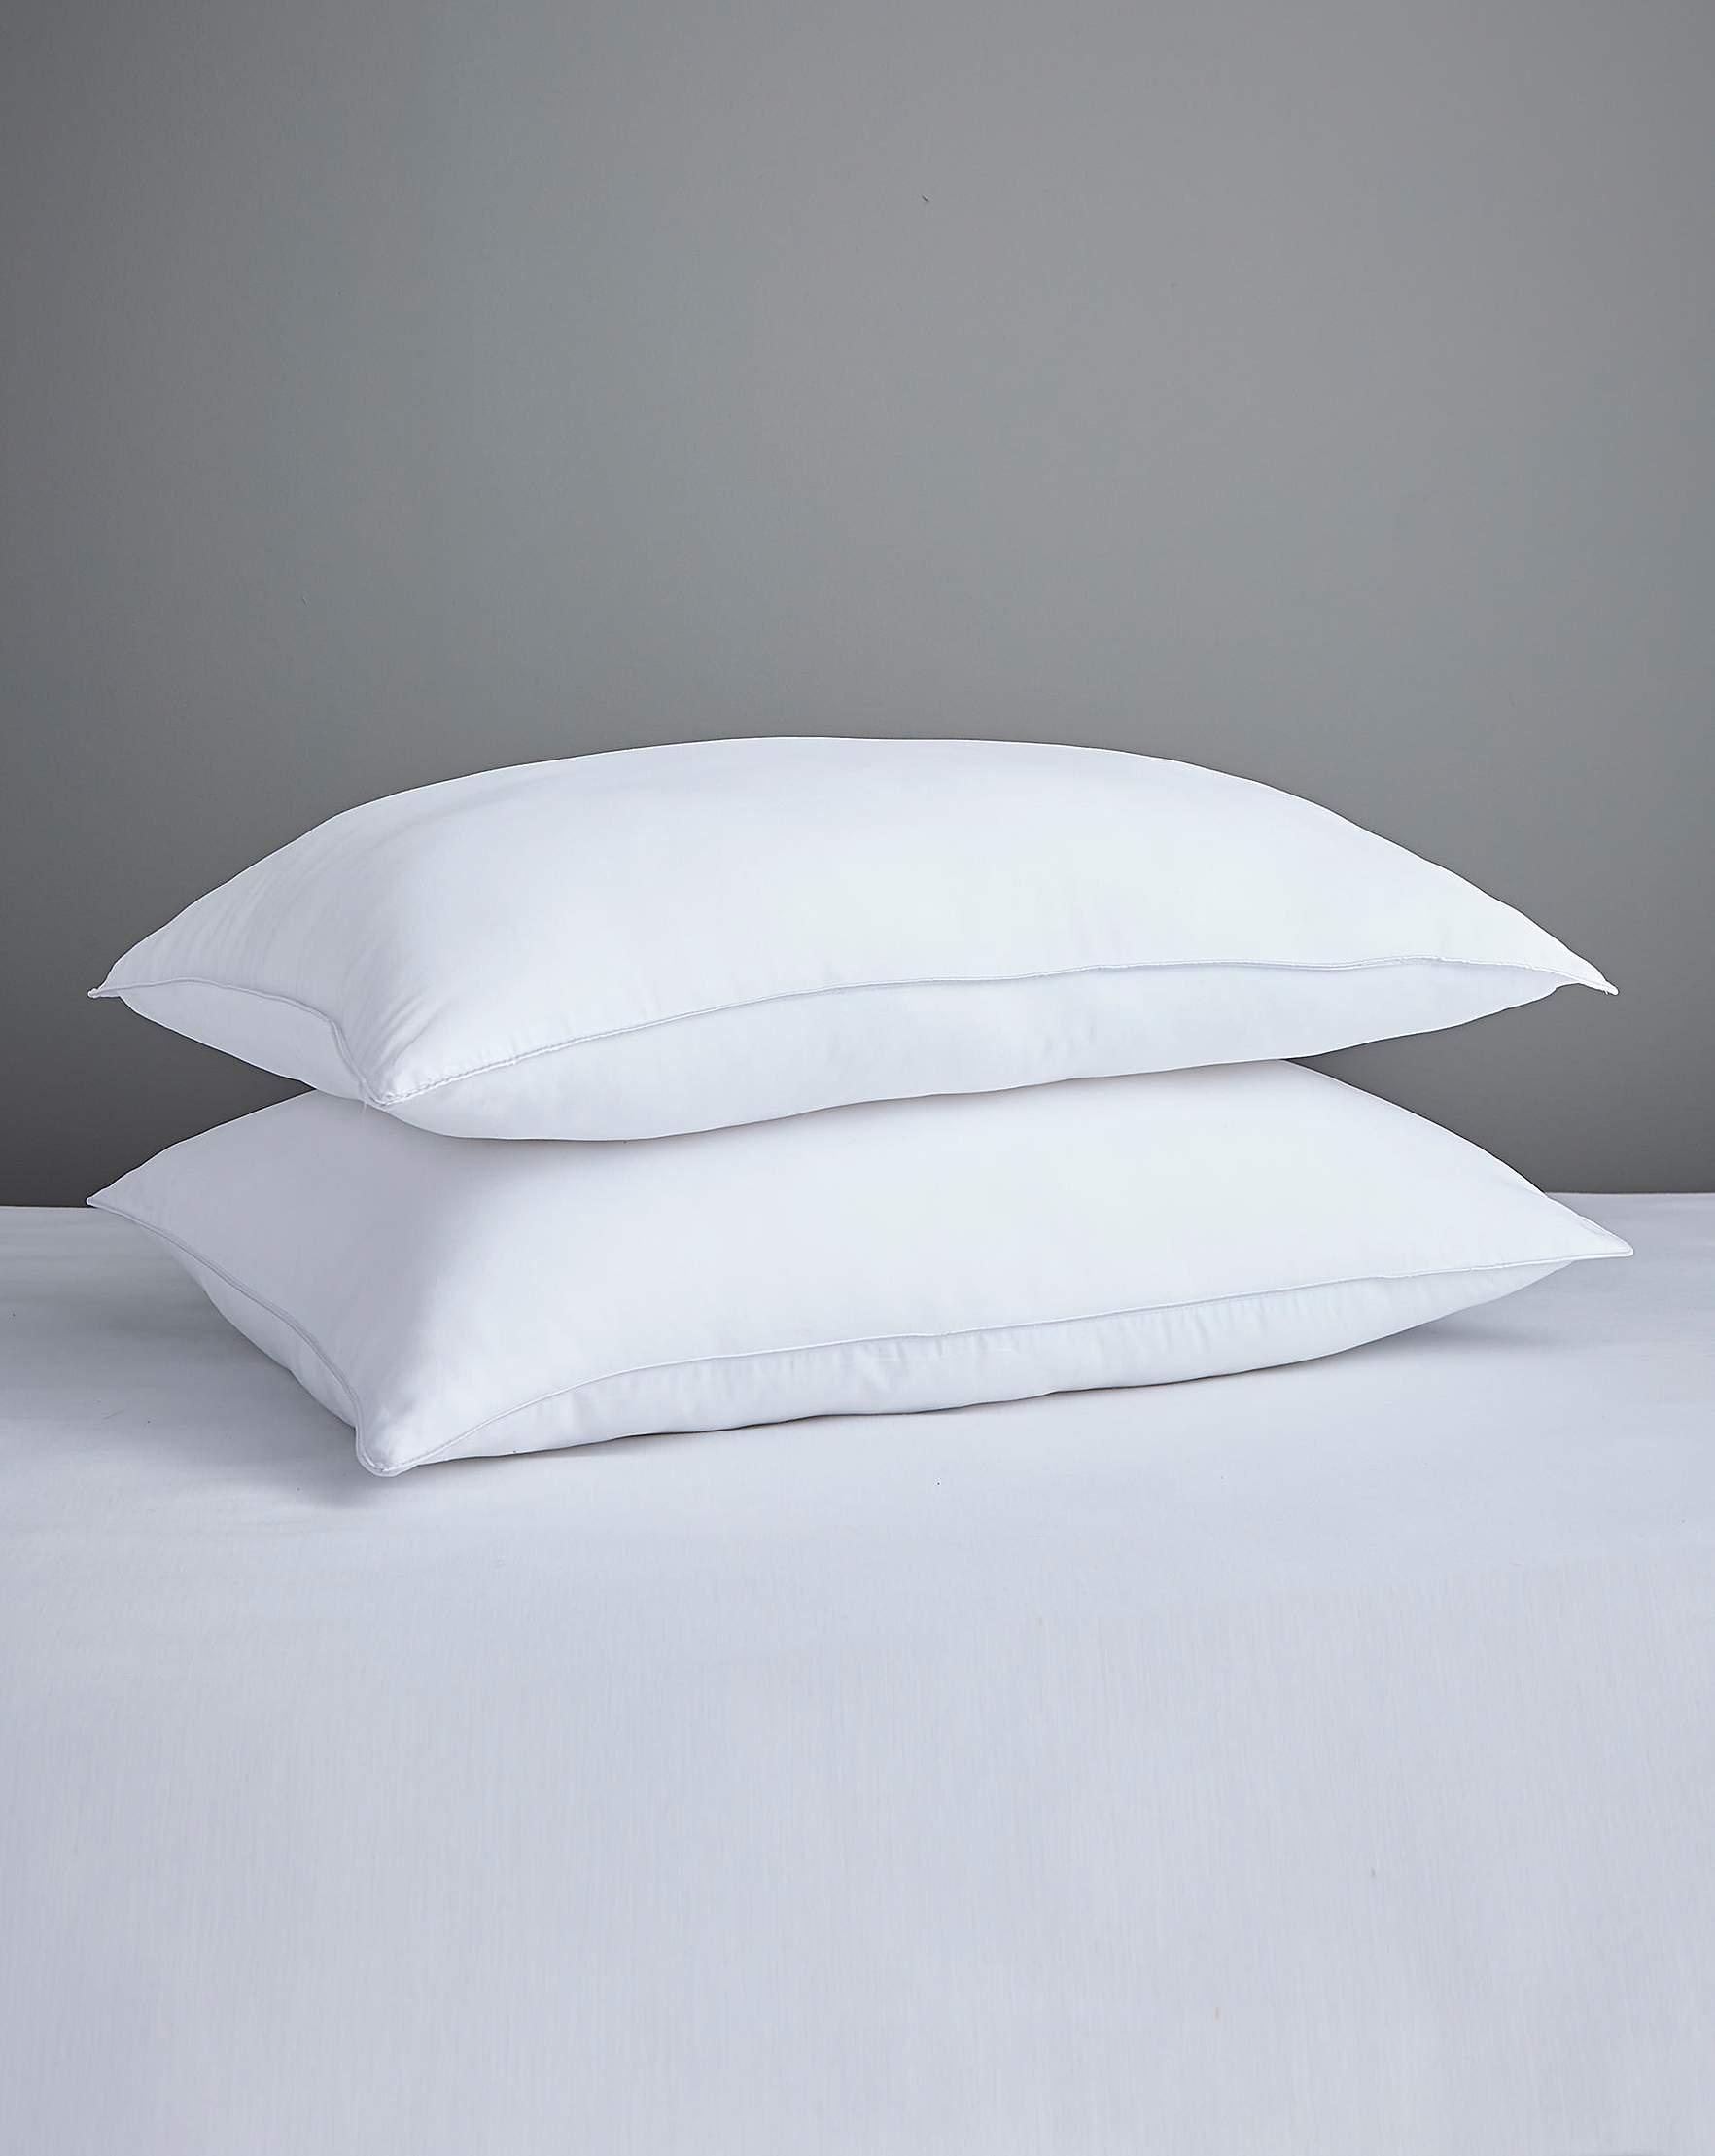 Soft Like Down Pillow  69c27346f1